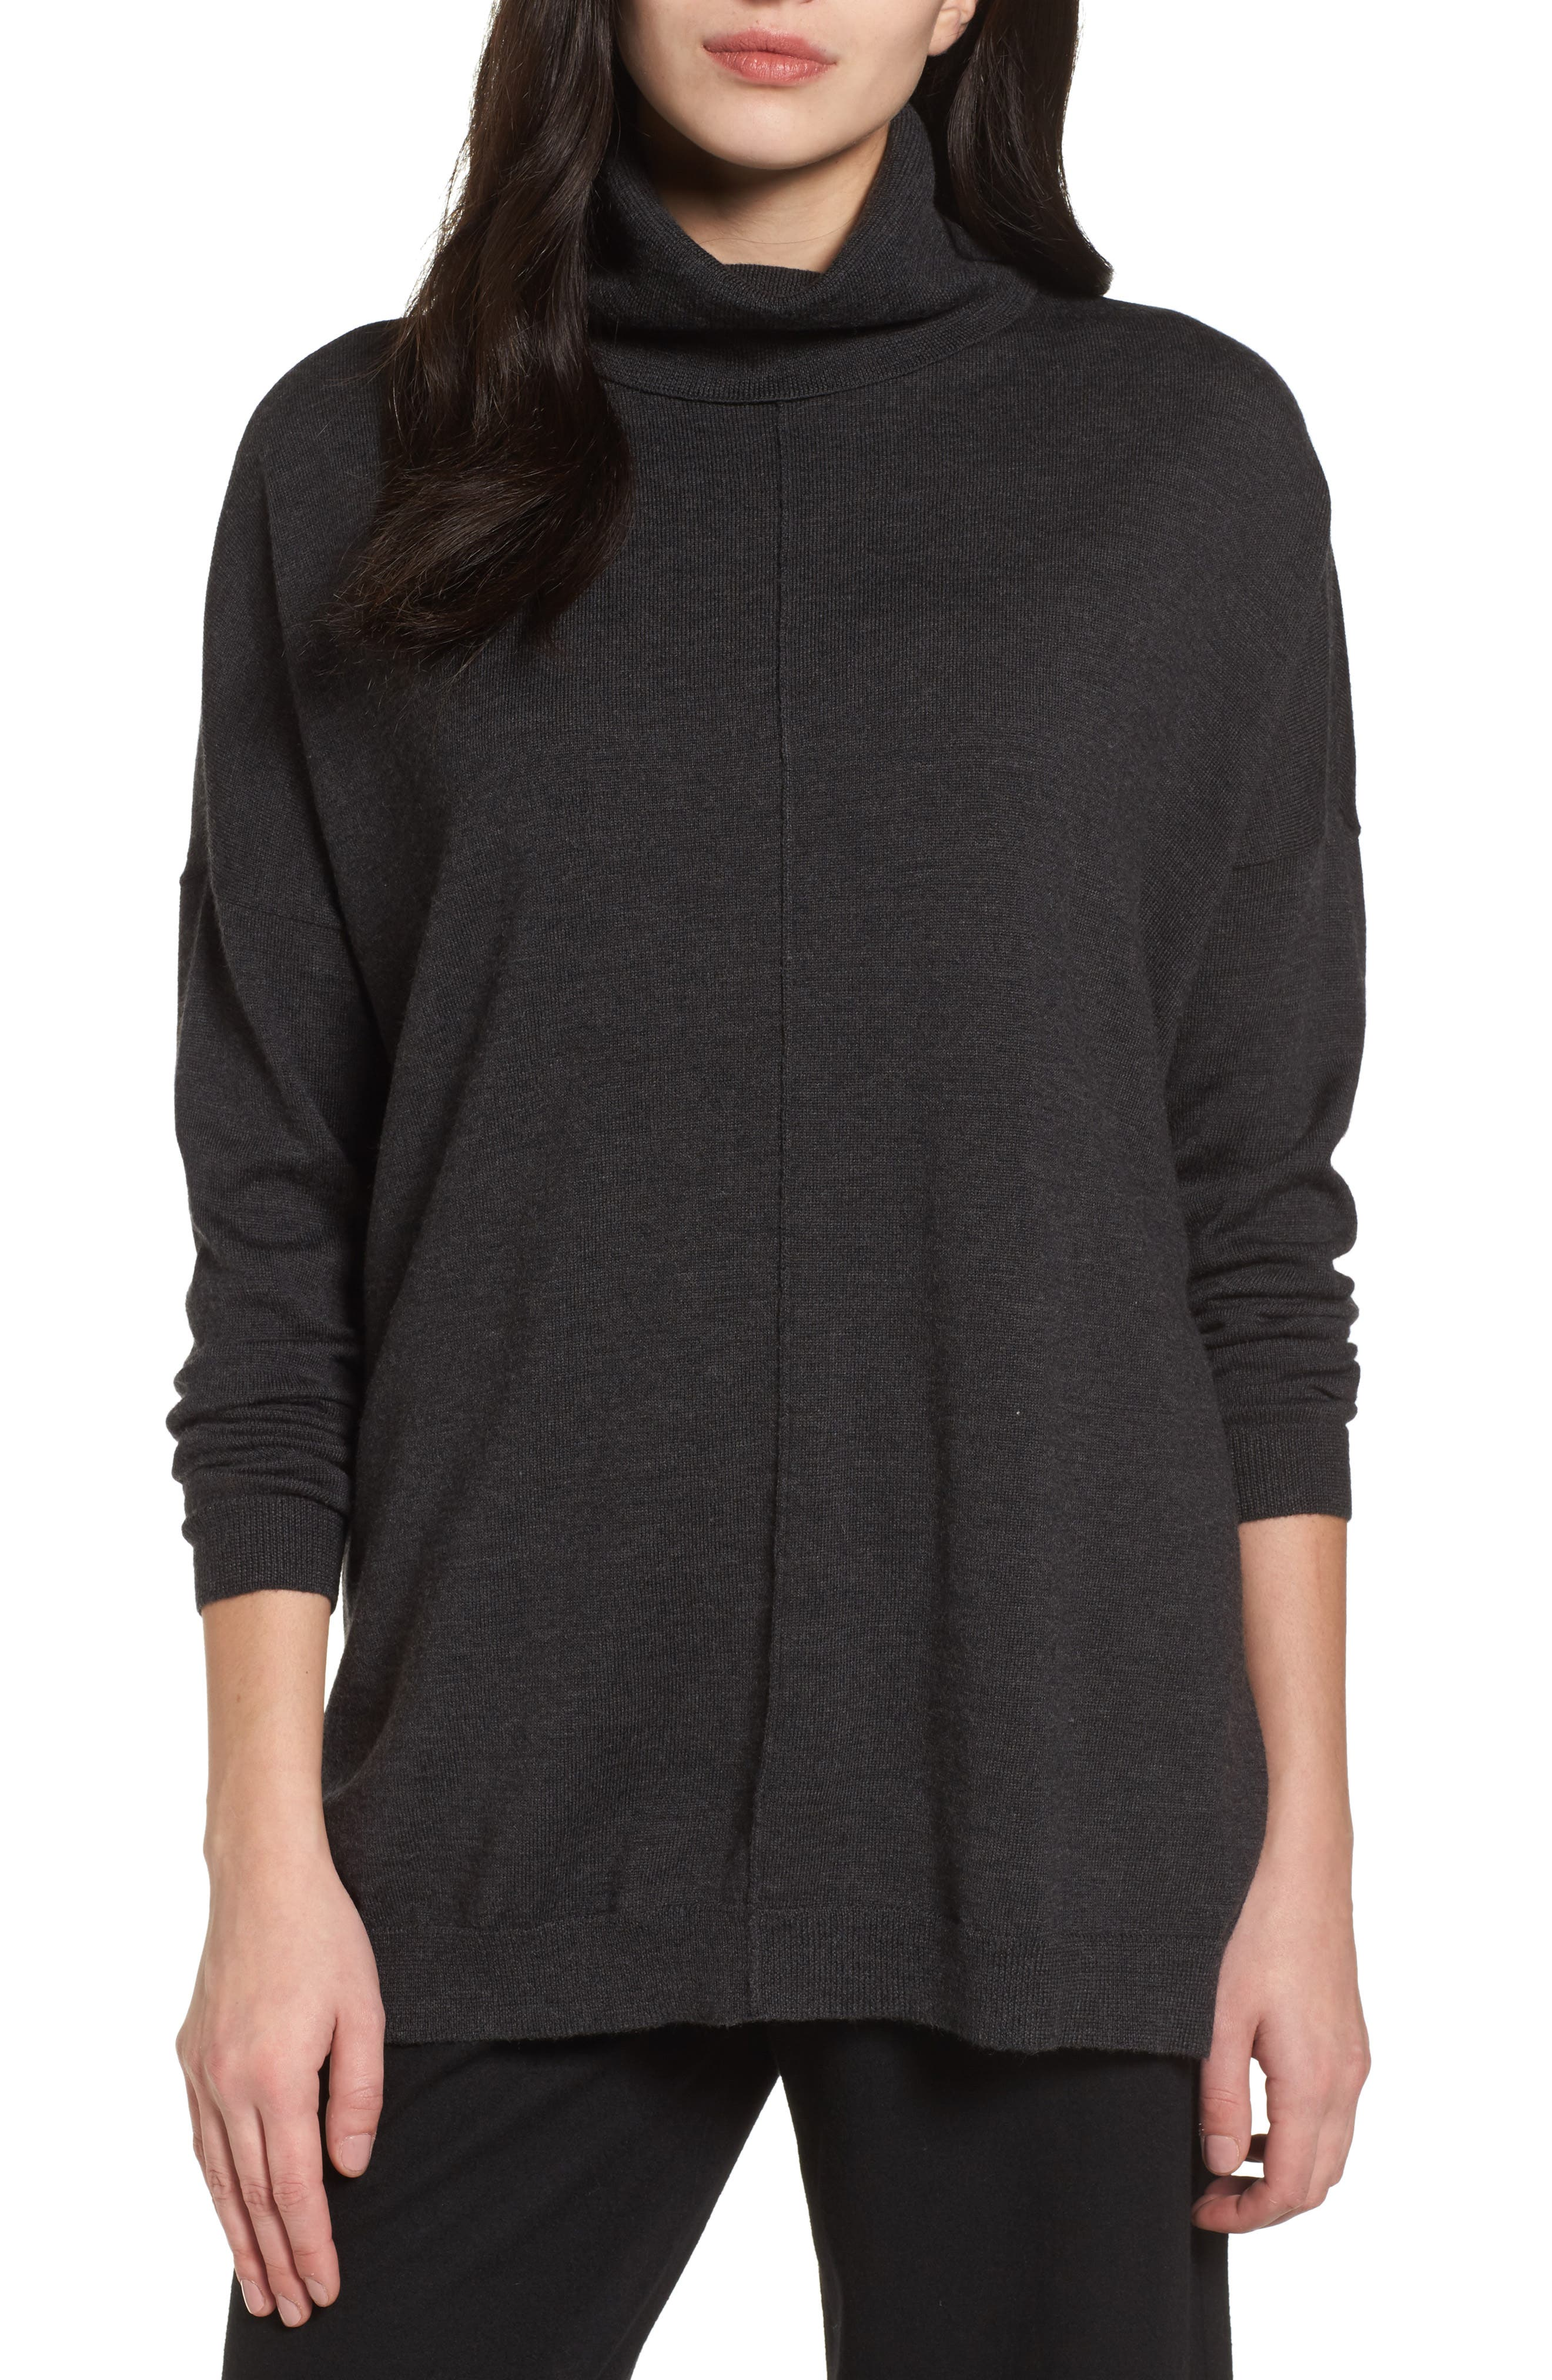 Merino Wool Boxy Turtleneck Sweater,                             Main thumbnail 1, color,                             021